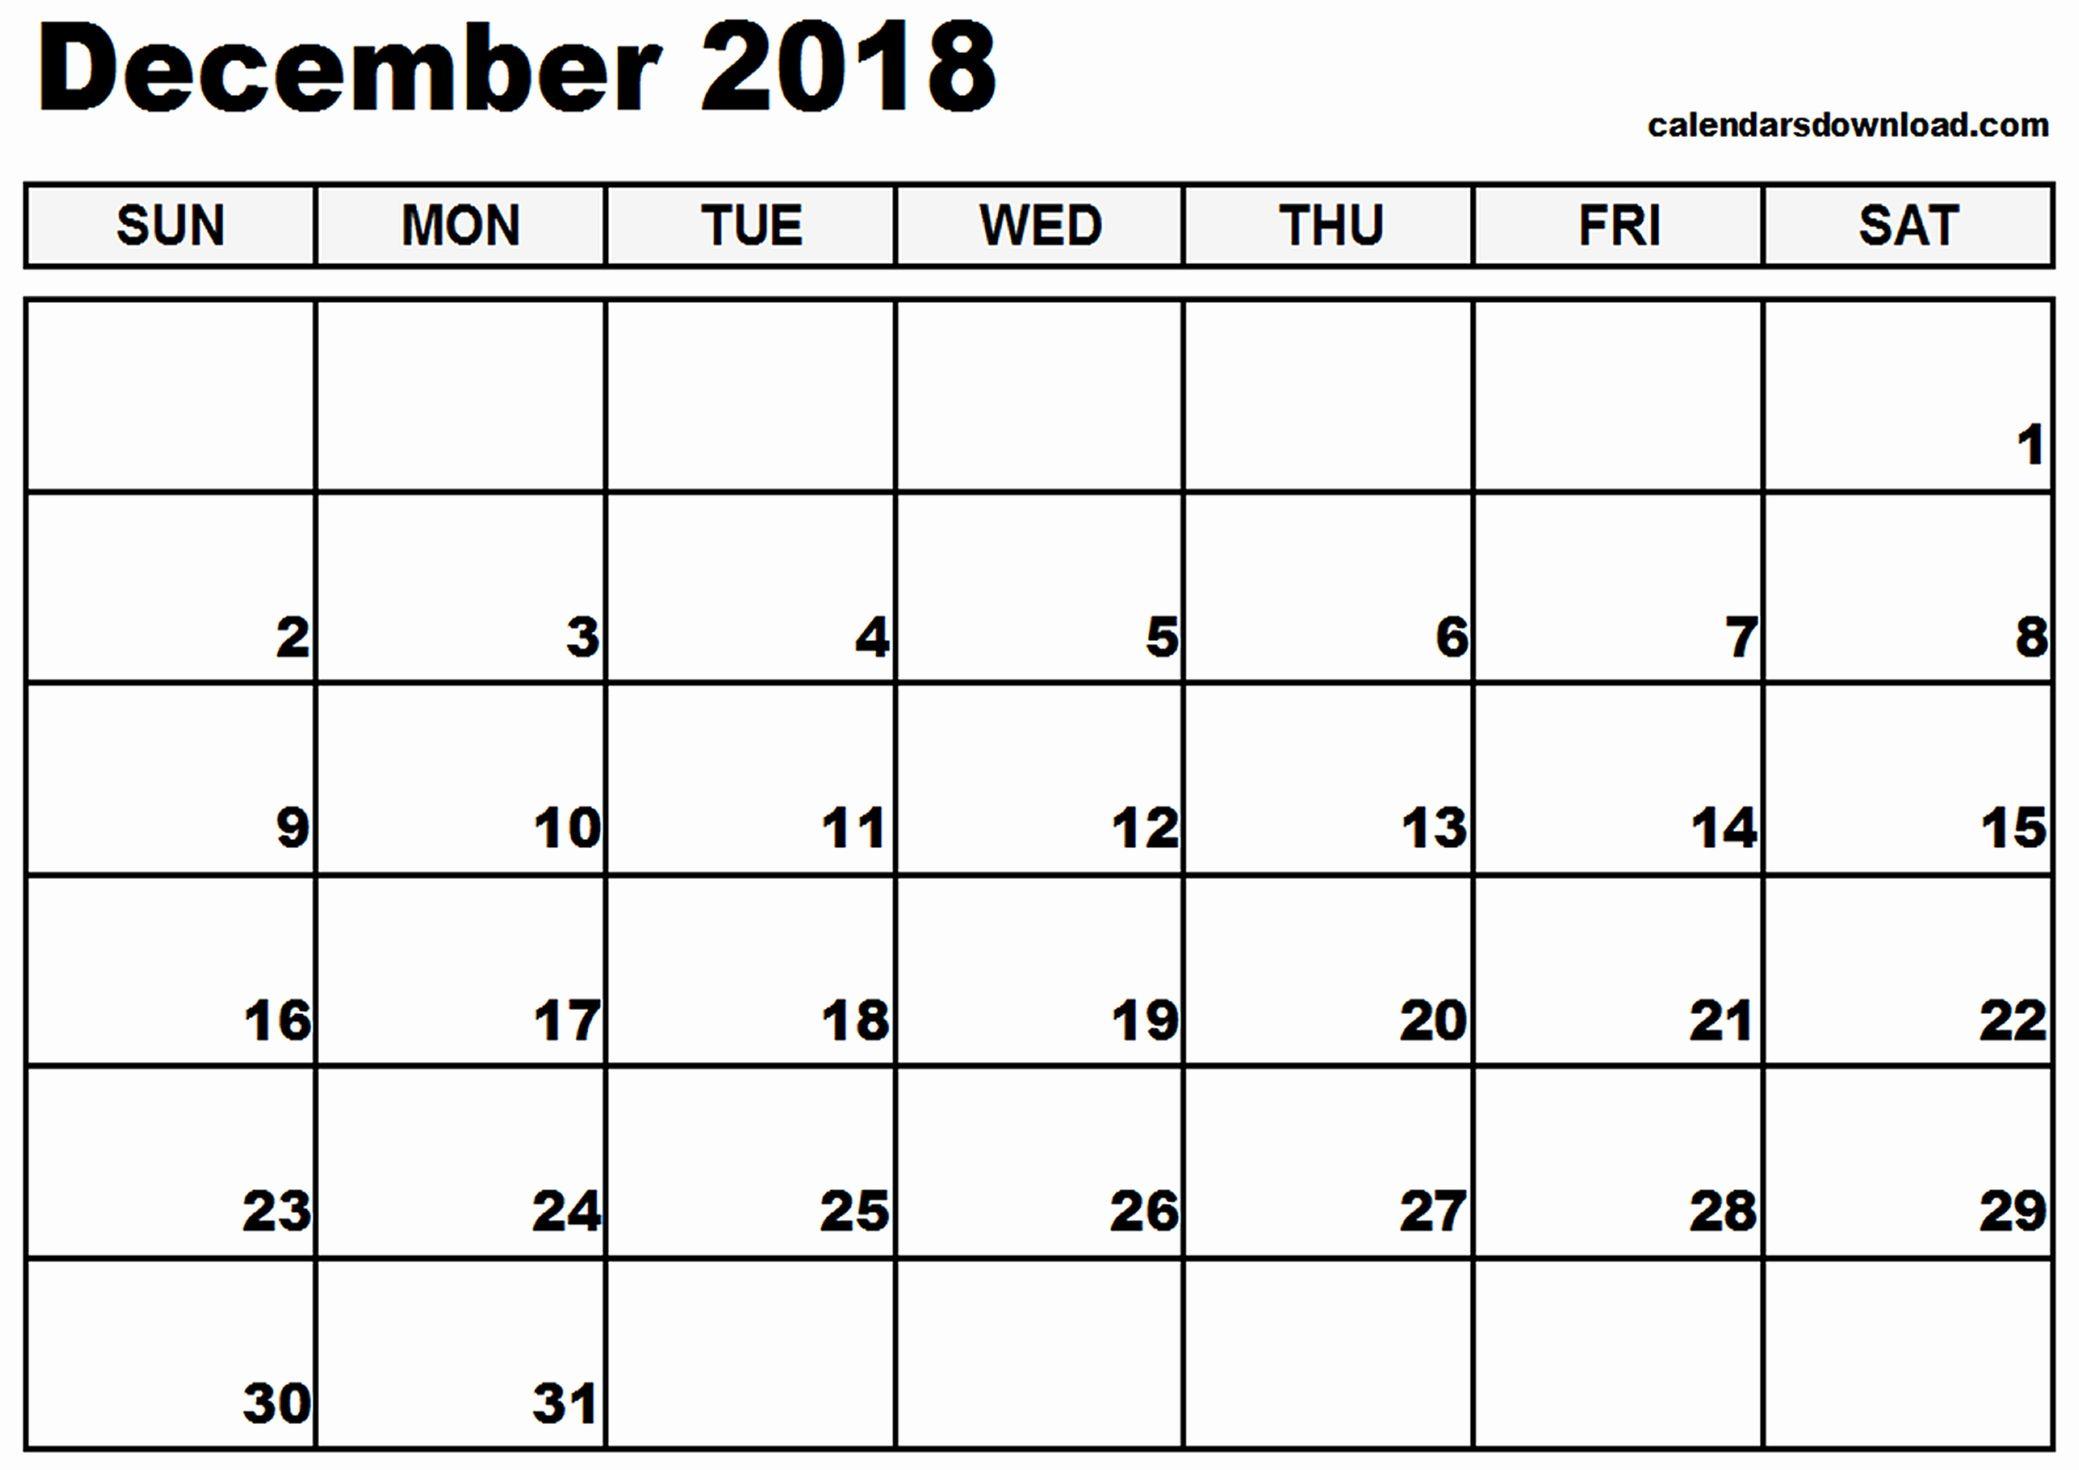 December 2018 Calendar Printable Template With Images Calendar